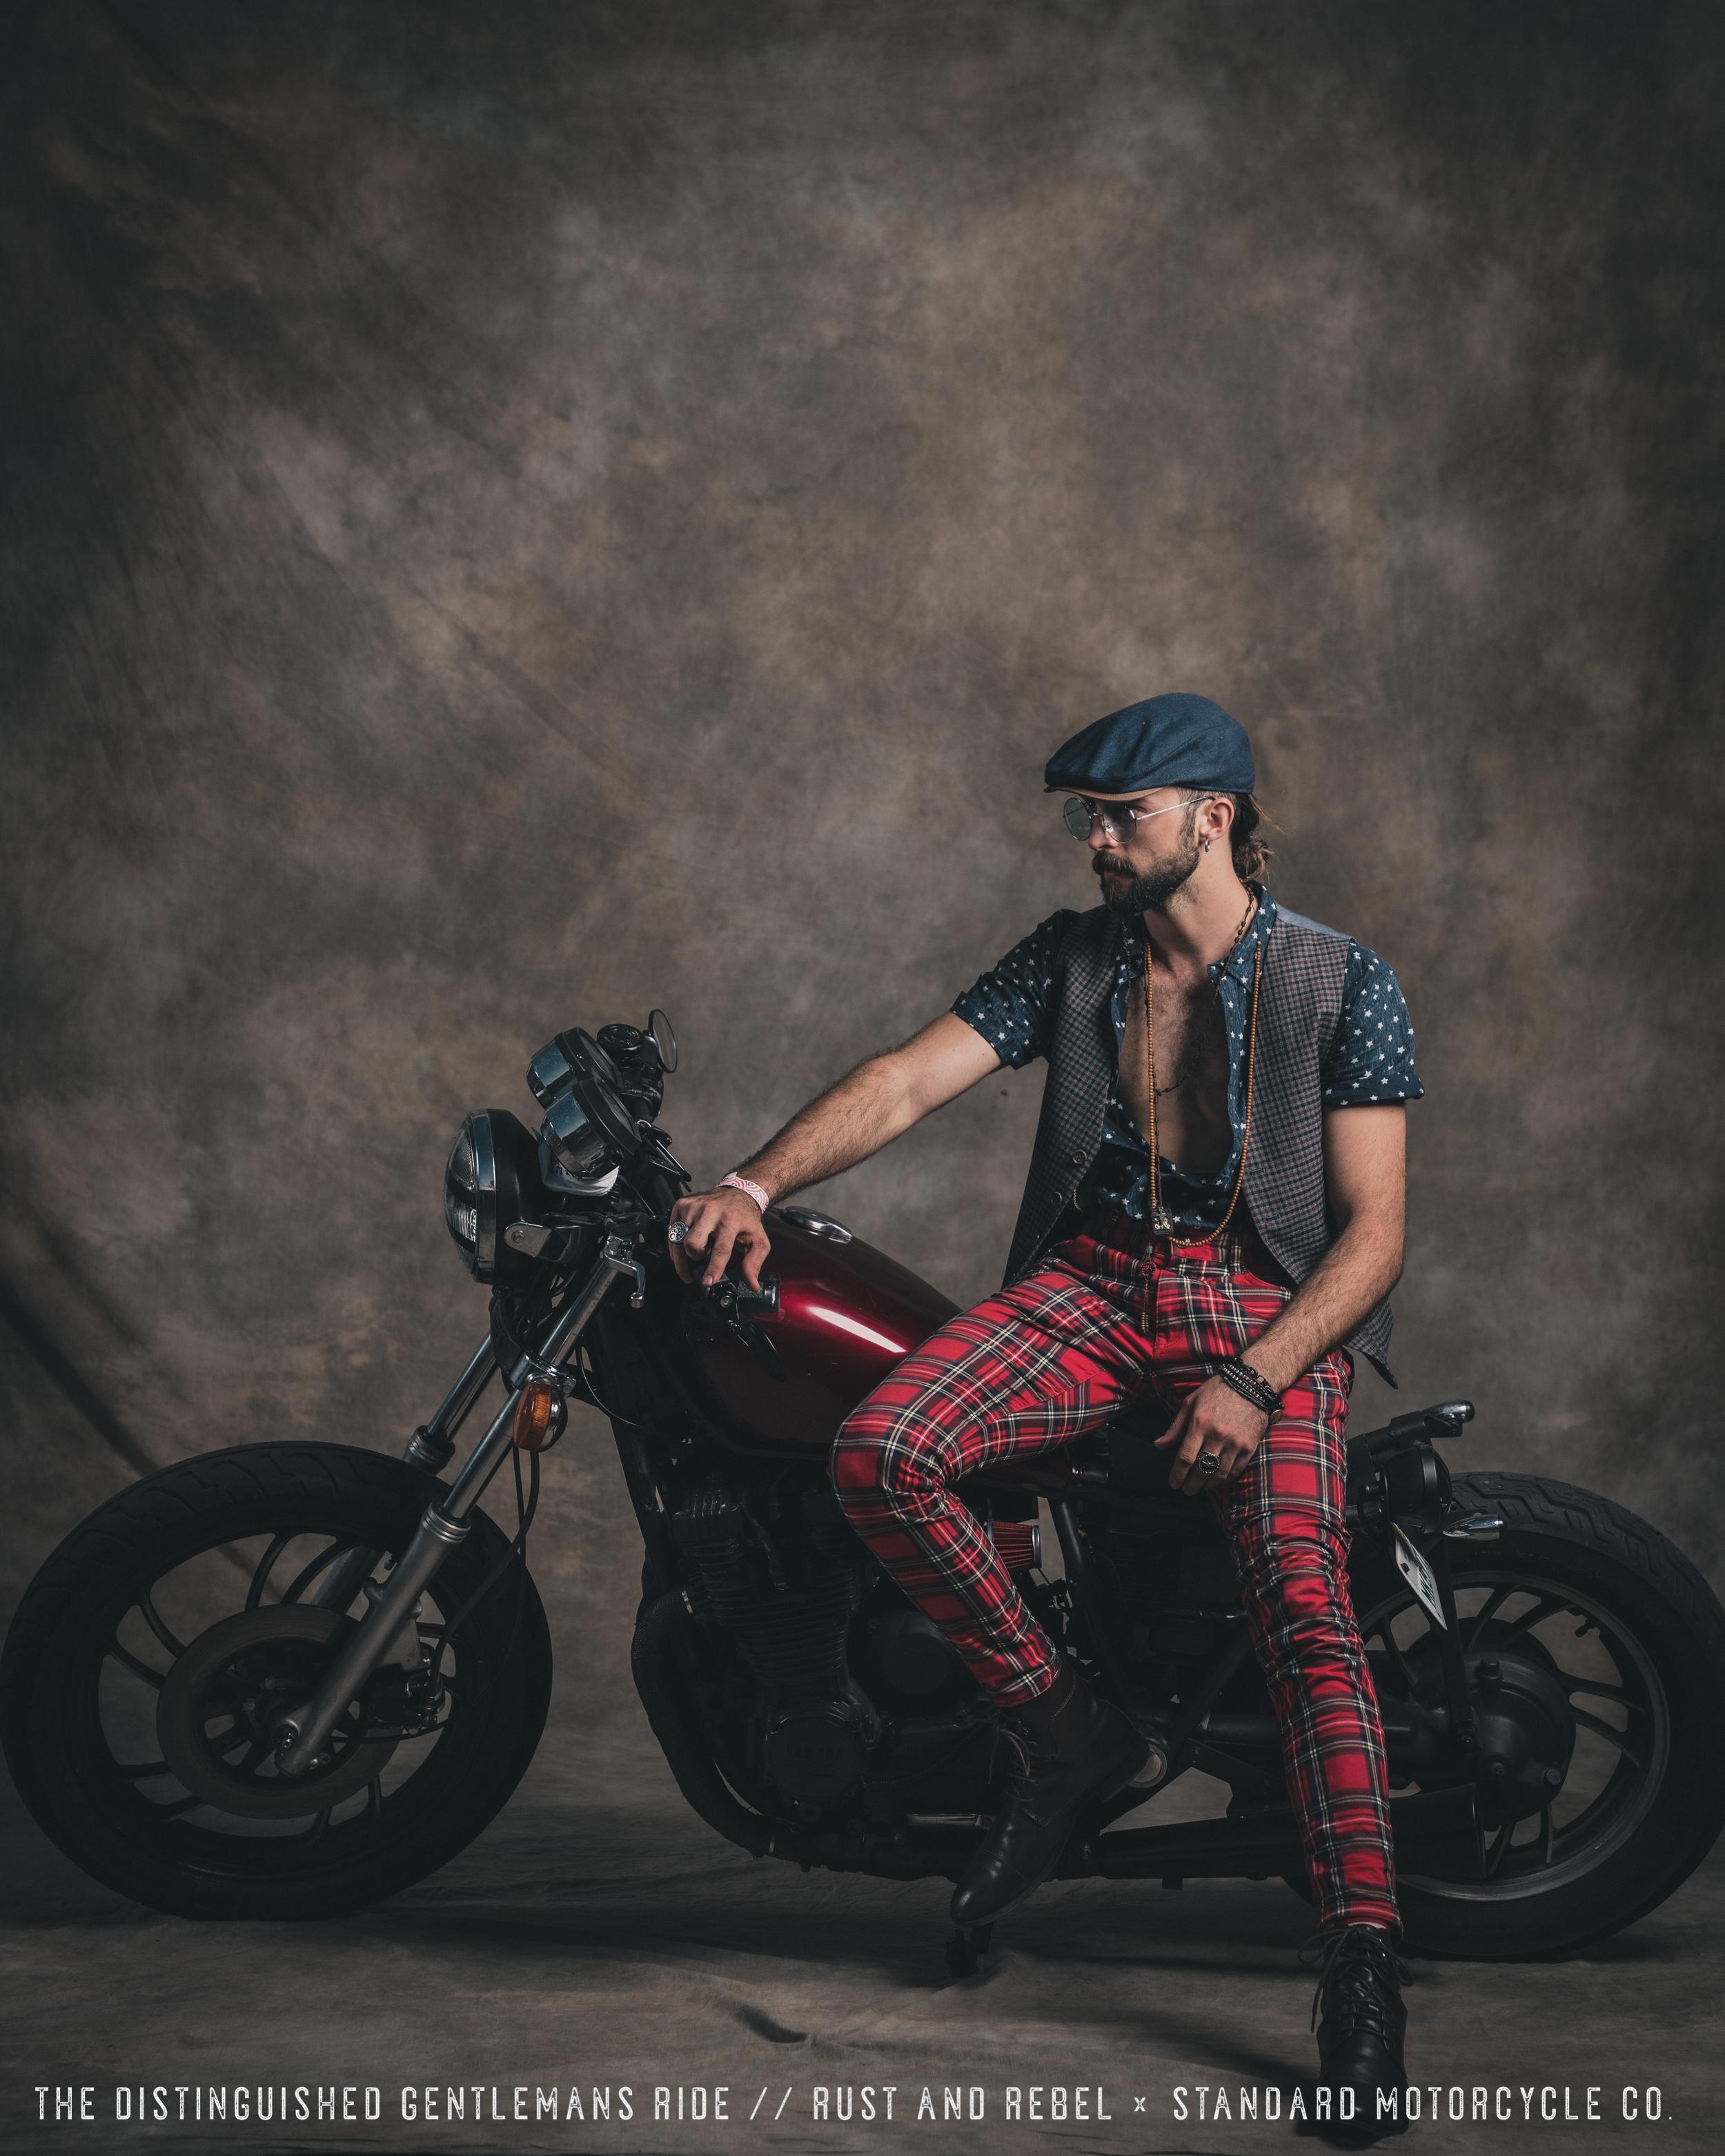 The Distinguished Gentleman's Ride 2019 [PEOPLE - PHOTO BY @MIKEDUNNUSA] - 0157.jpg